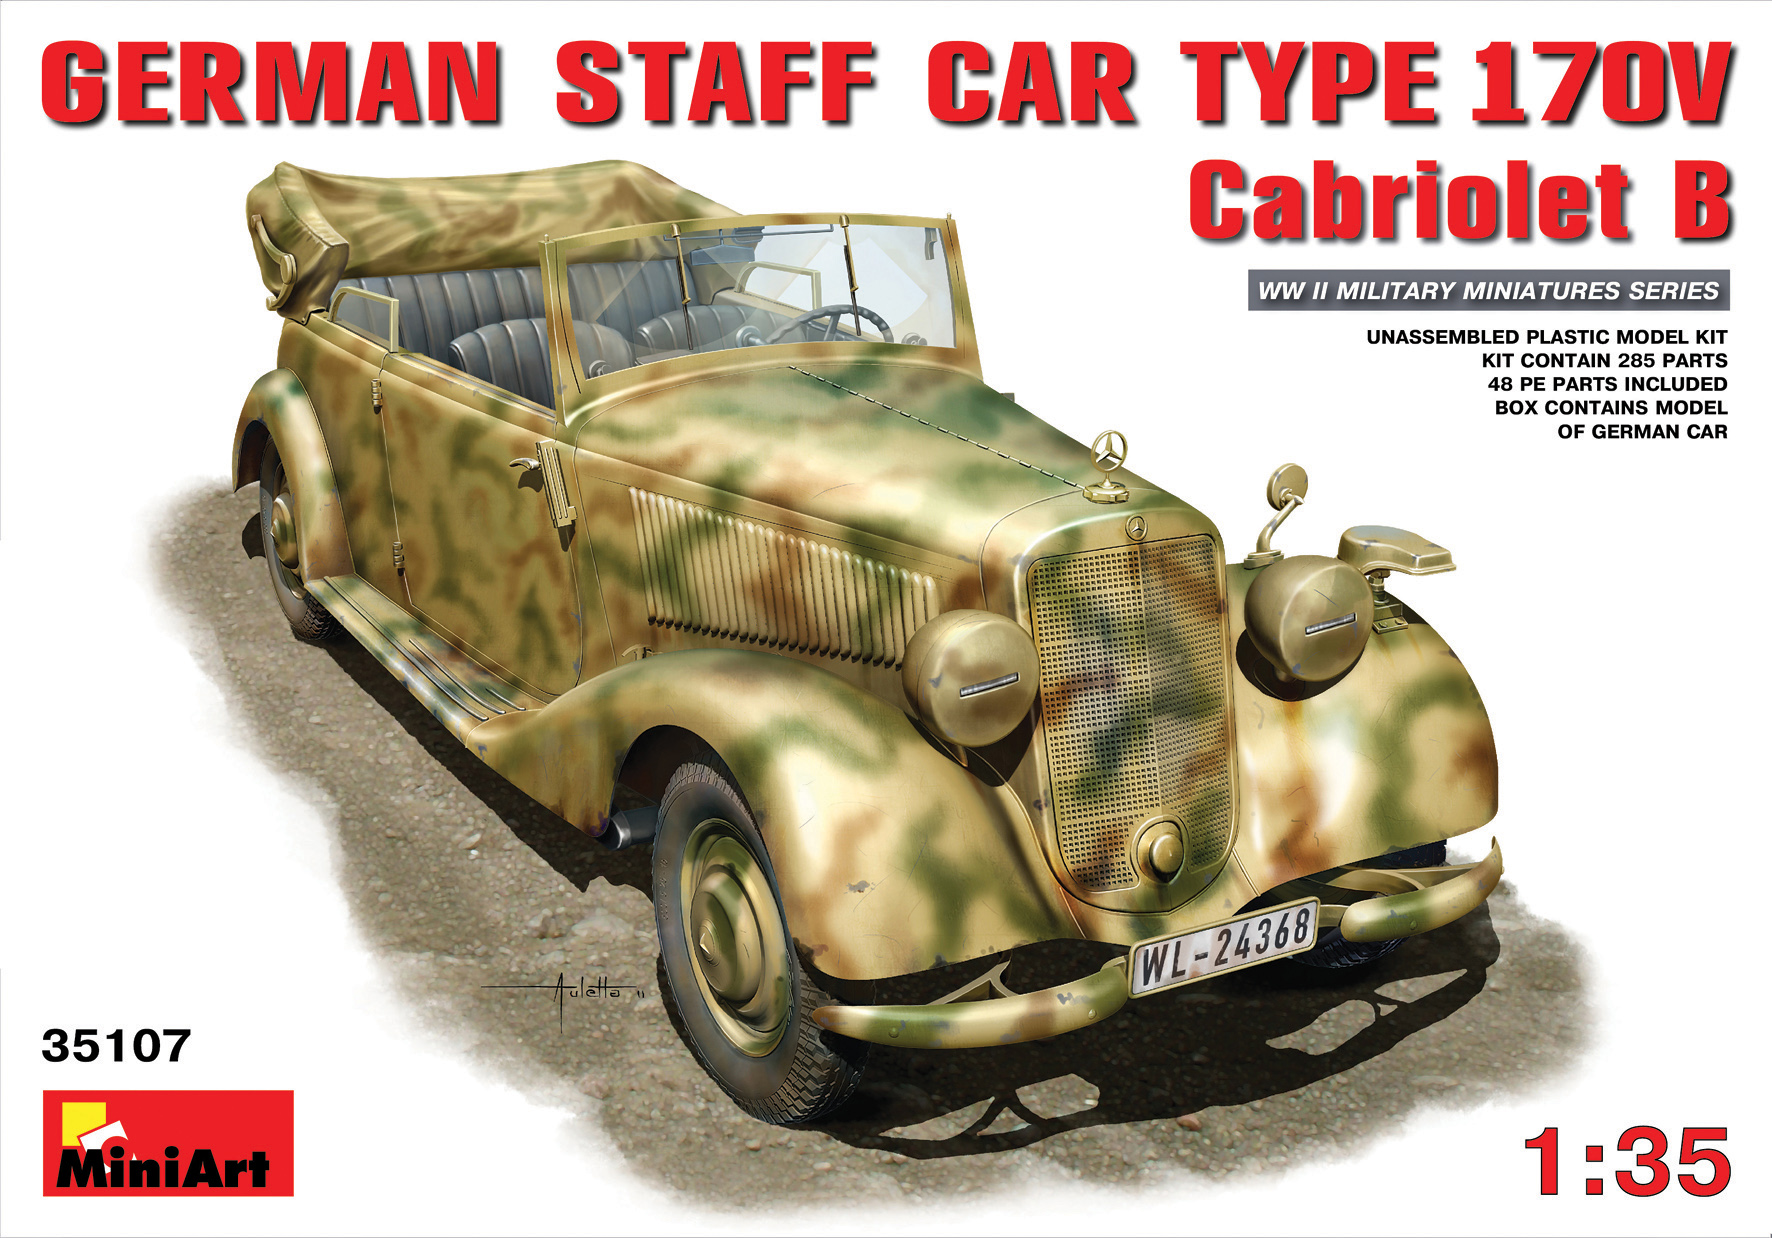 GERMAN CAR TYPE 170V Cabriolet B.